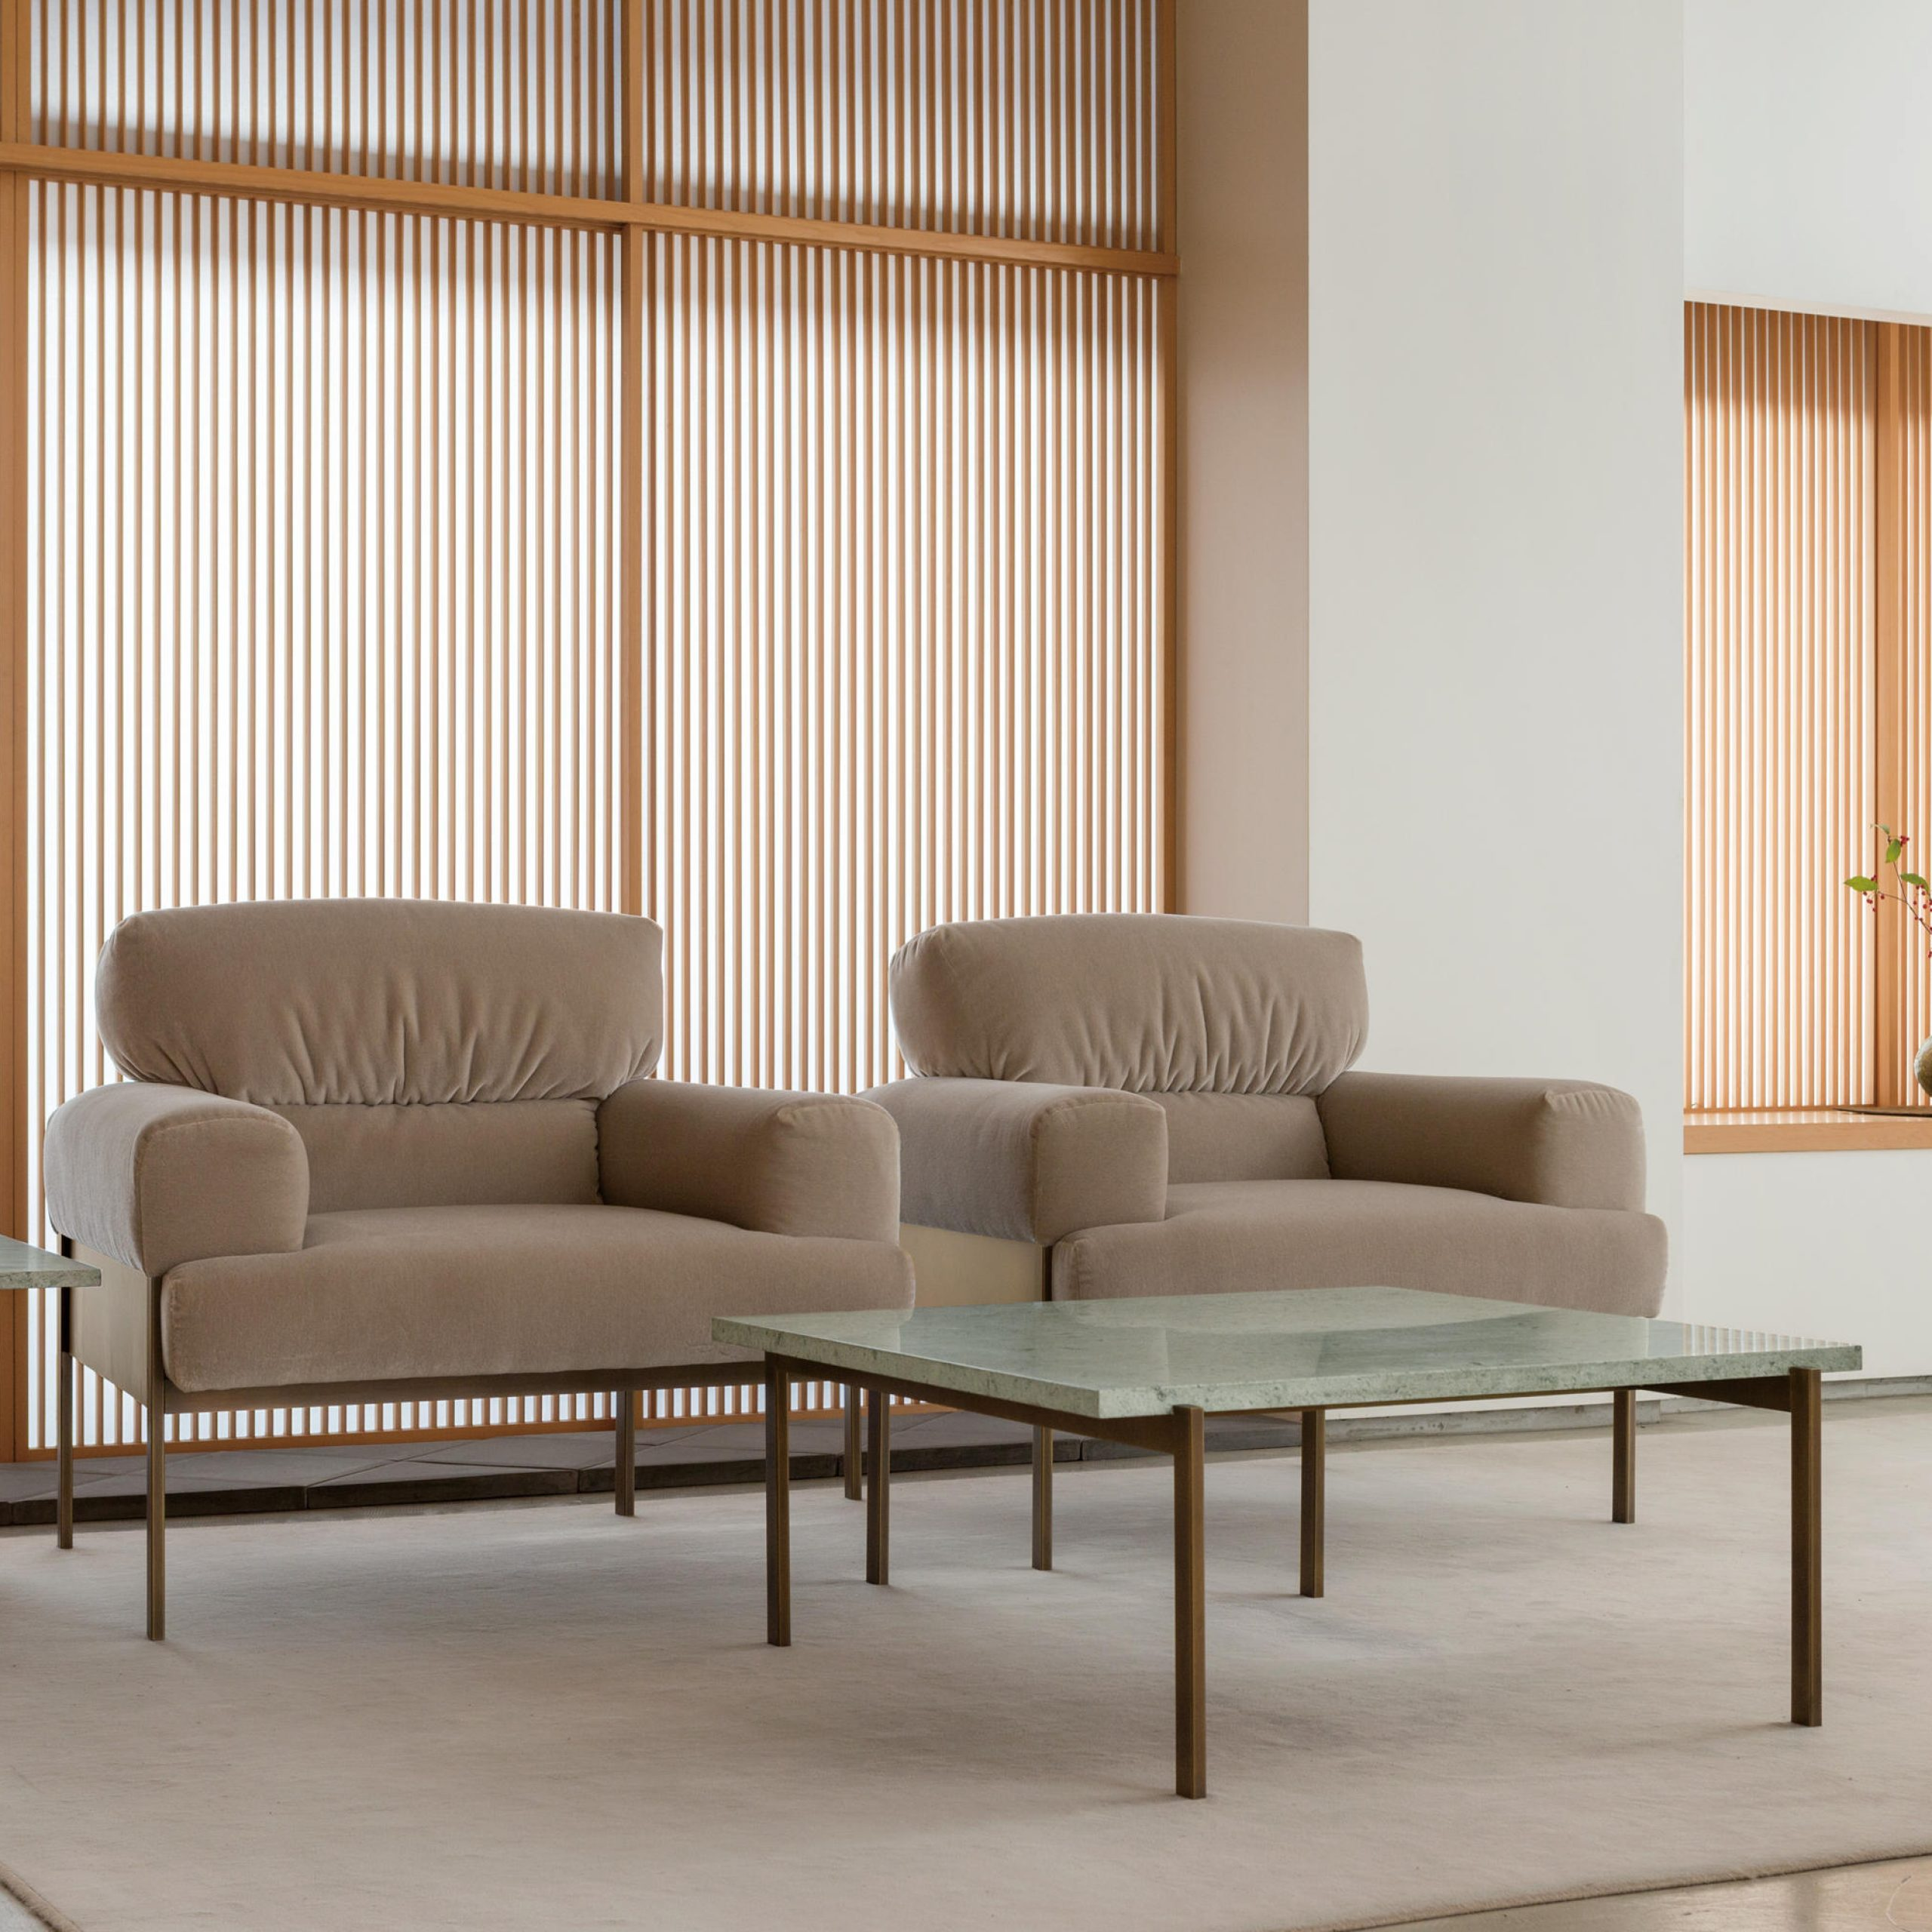 Suki | Armchair & Designer Furniture | Architonic Inside Suki Armchairs (View 6 of 15)